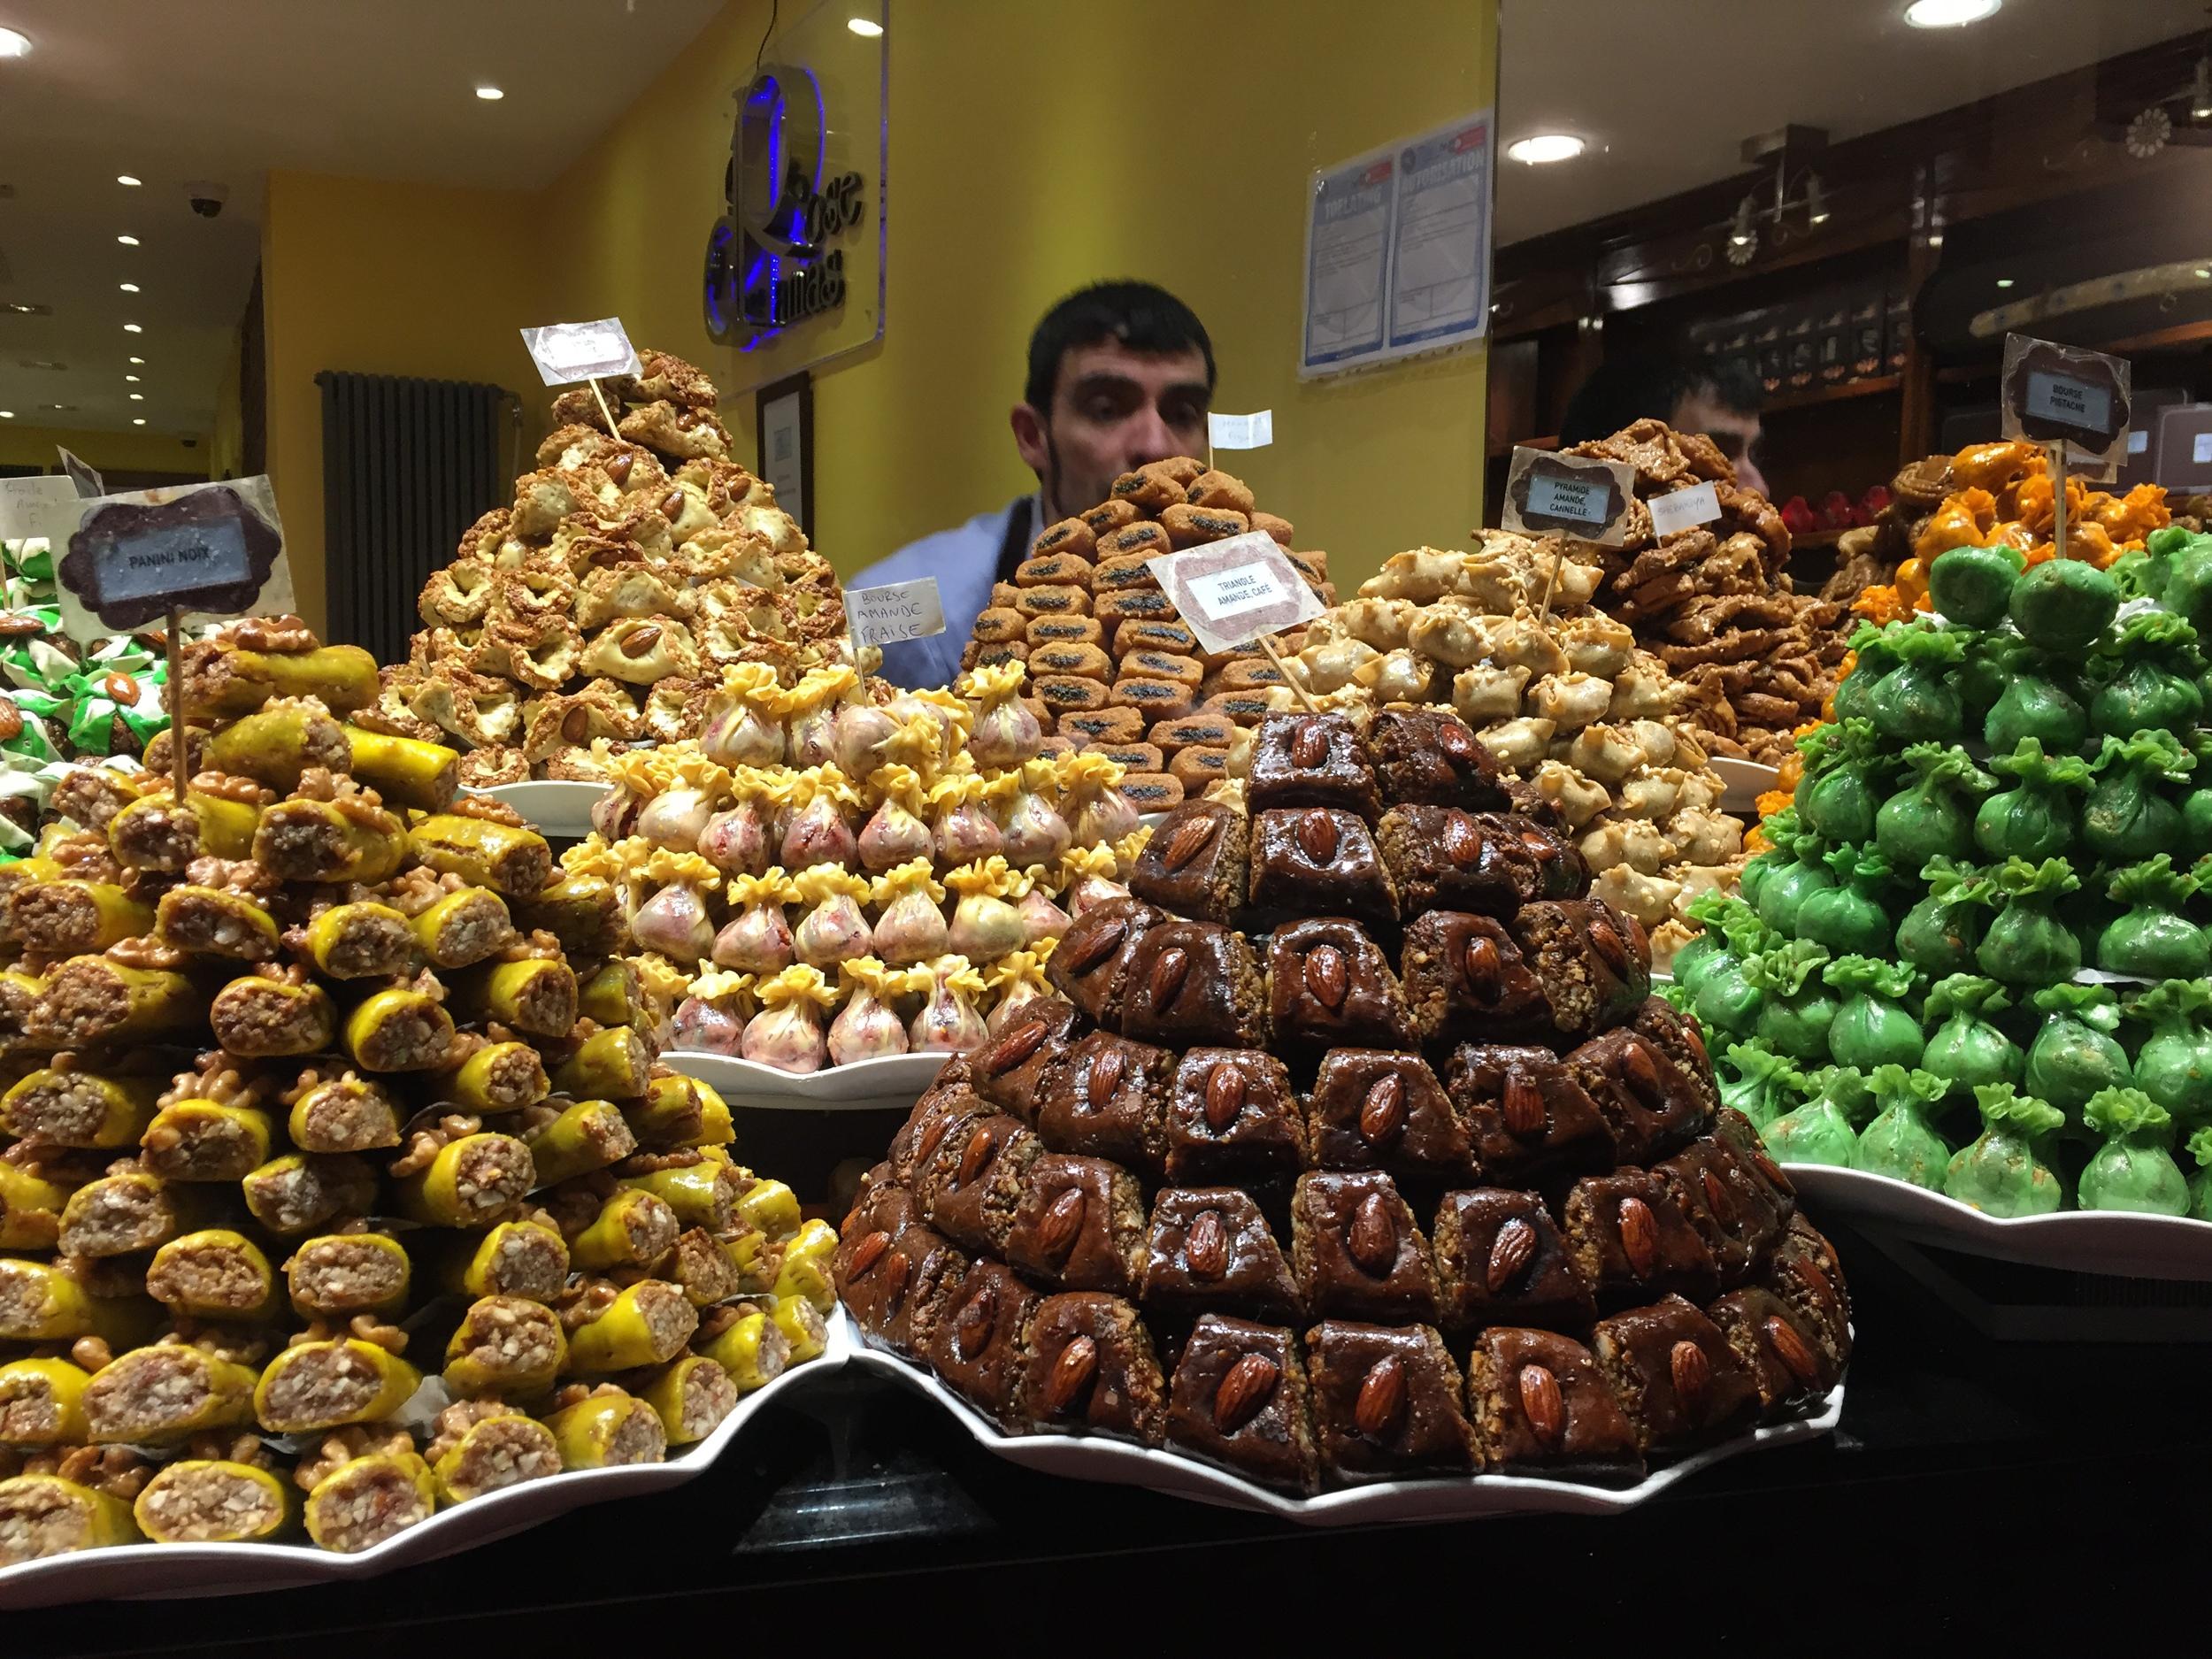 Pyramids of Mediterranean sweets...